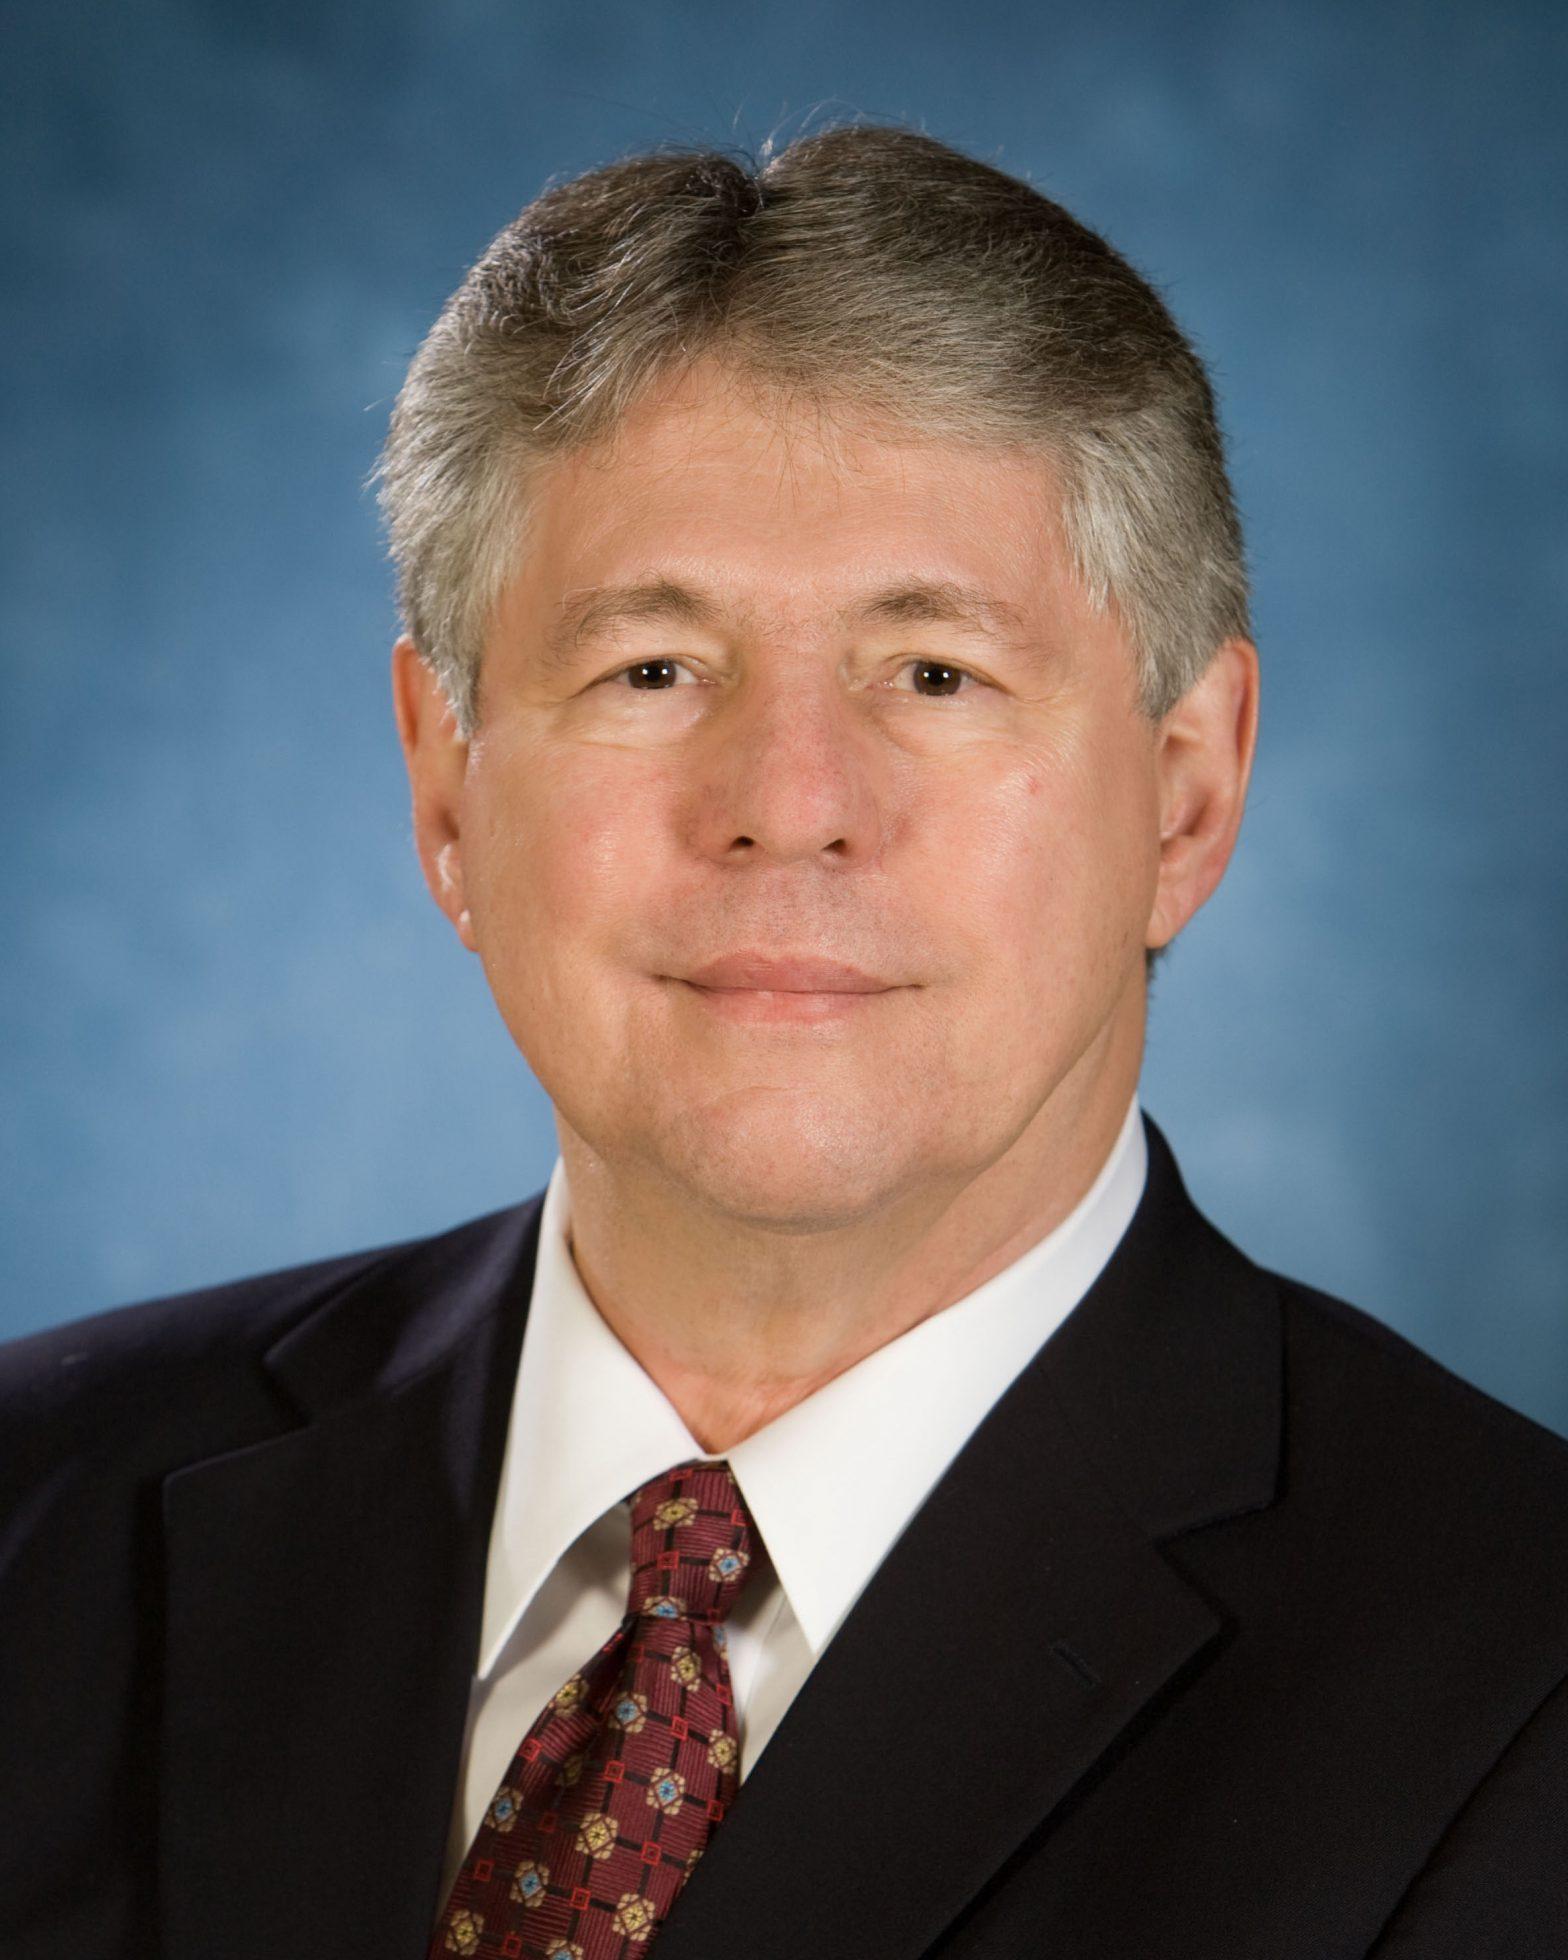 Photo of Curtin, Richard T